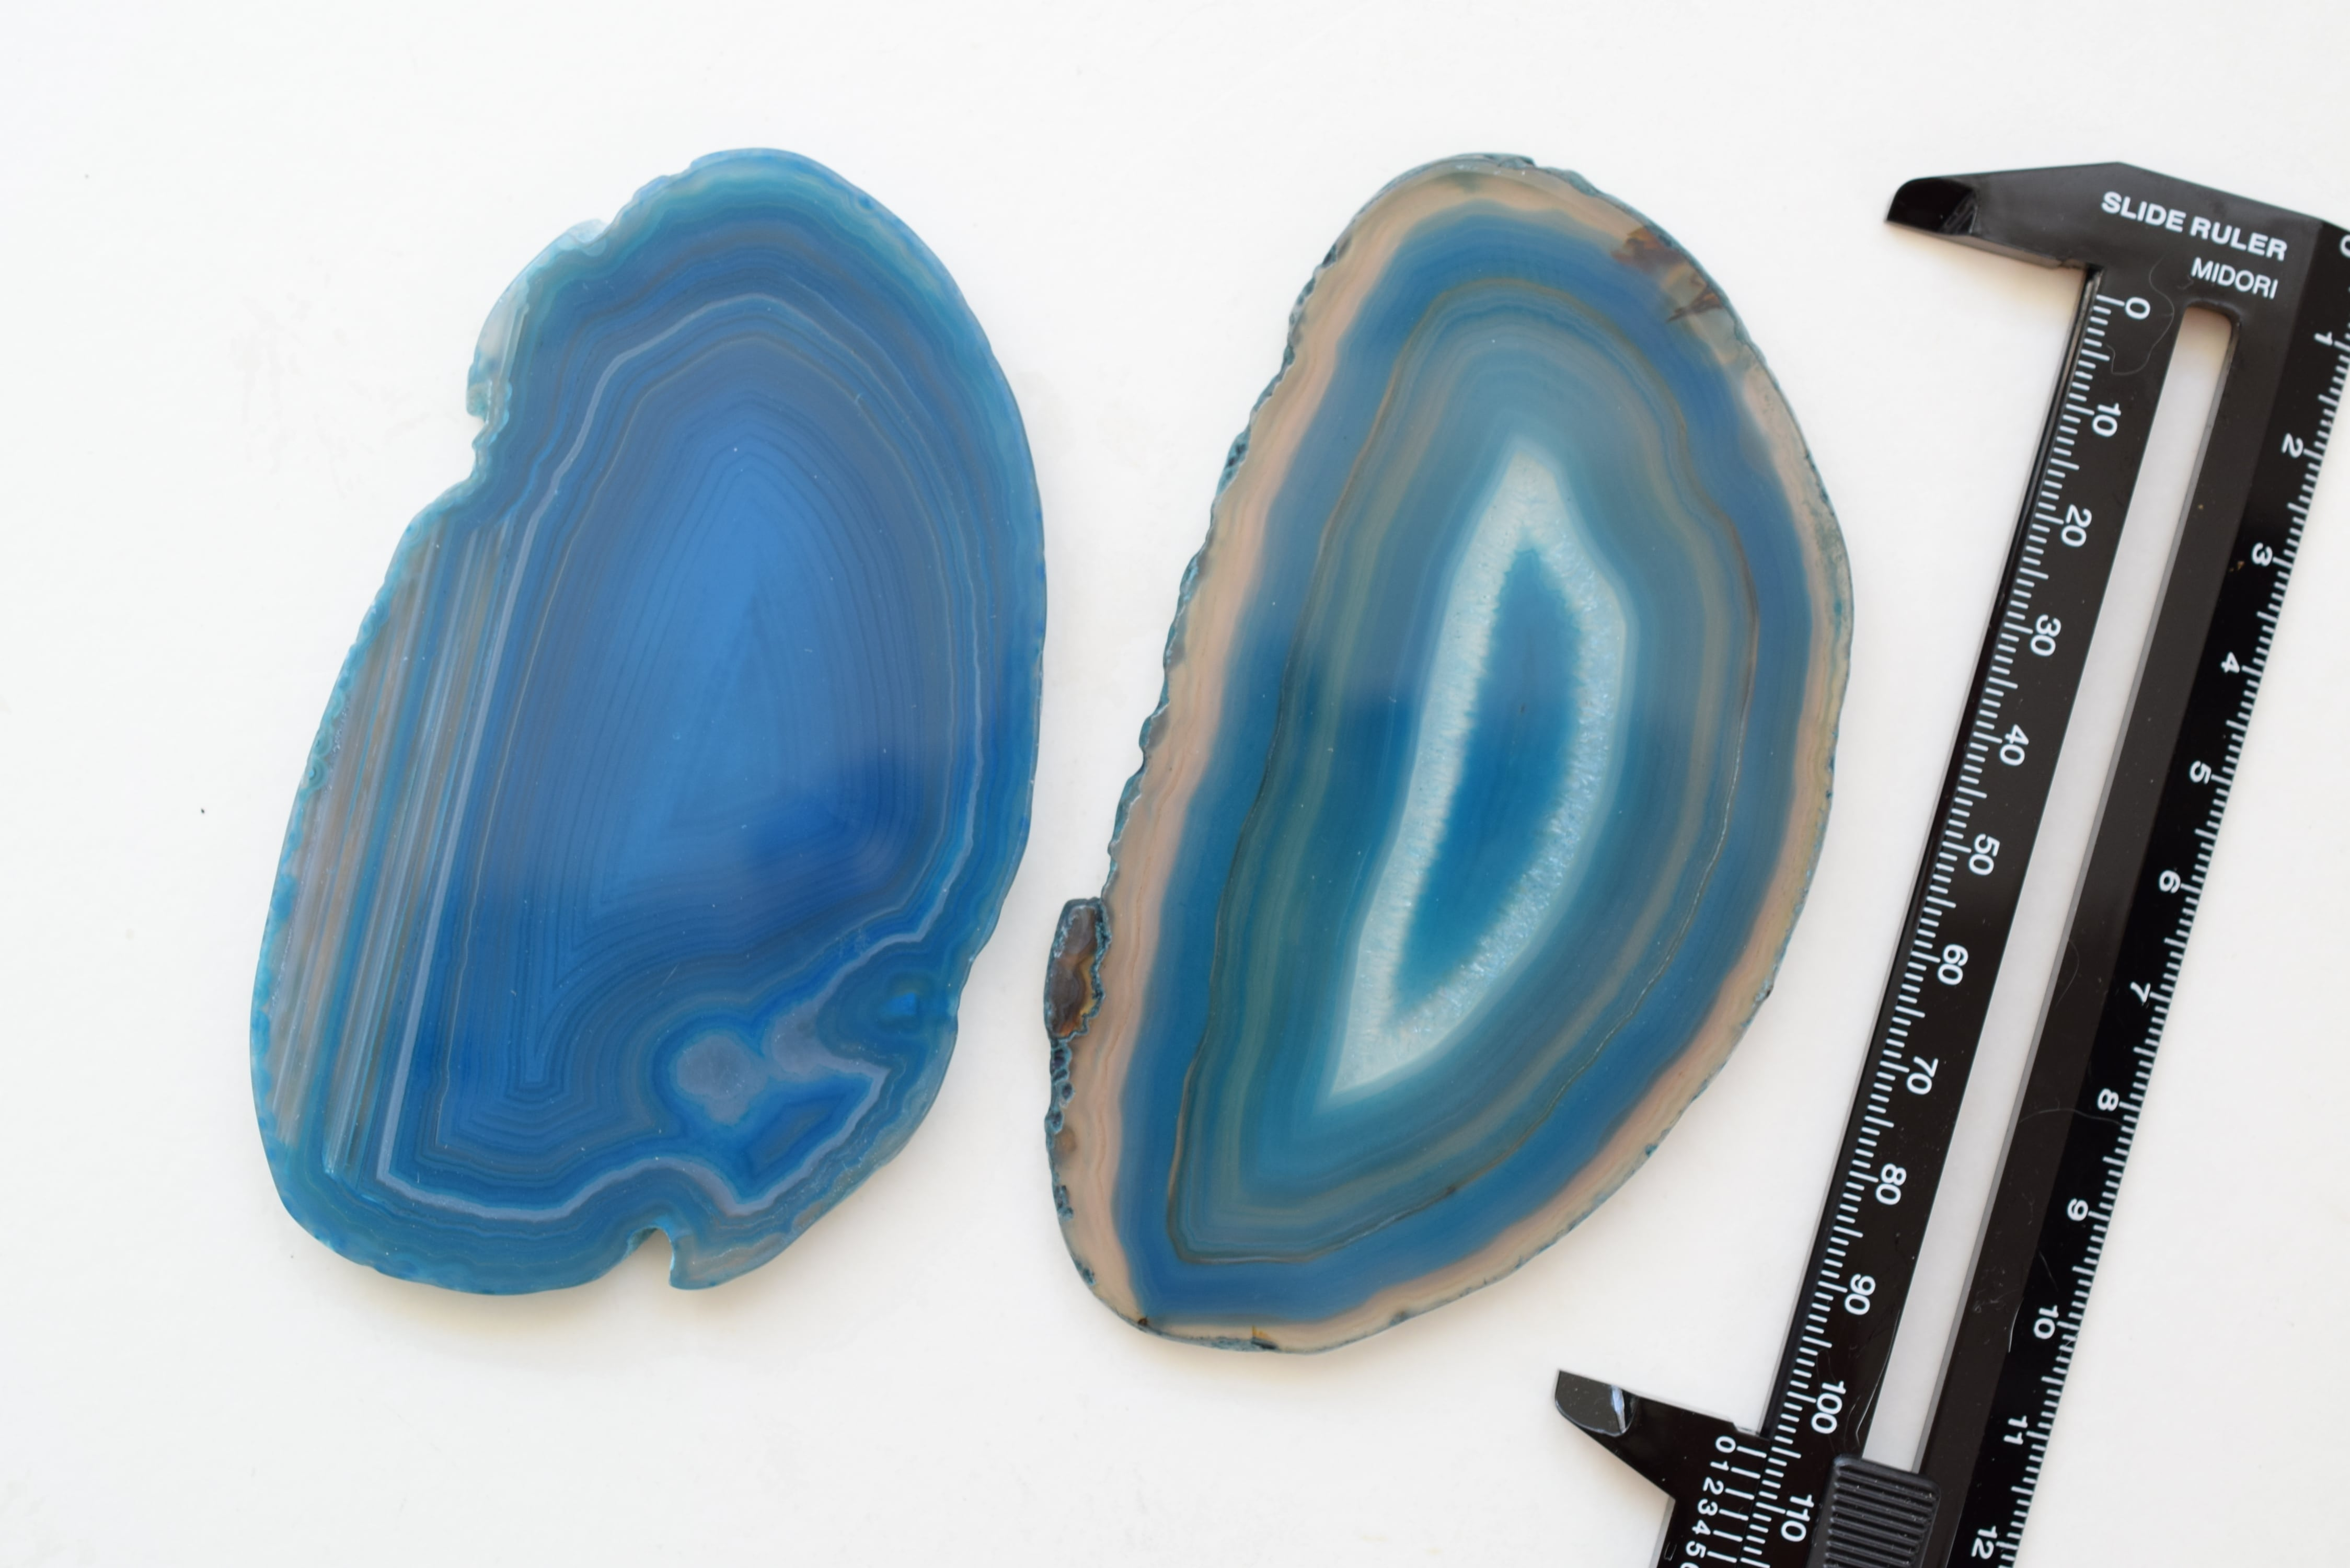 Big Size Agate slice  -Turquoise-/ビッグサイズ アゲートスライス ターコイズ